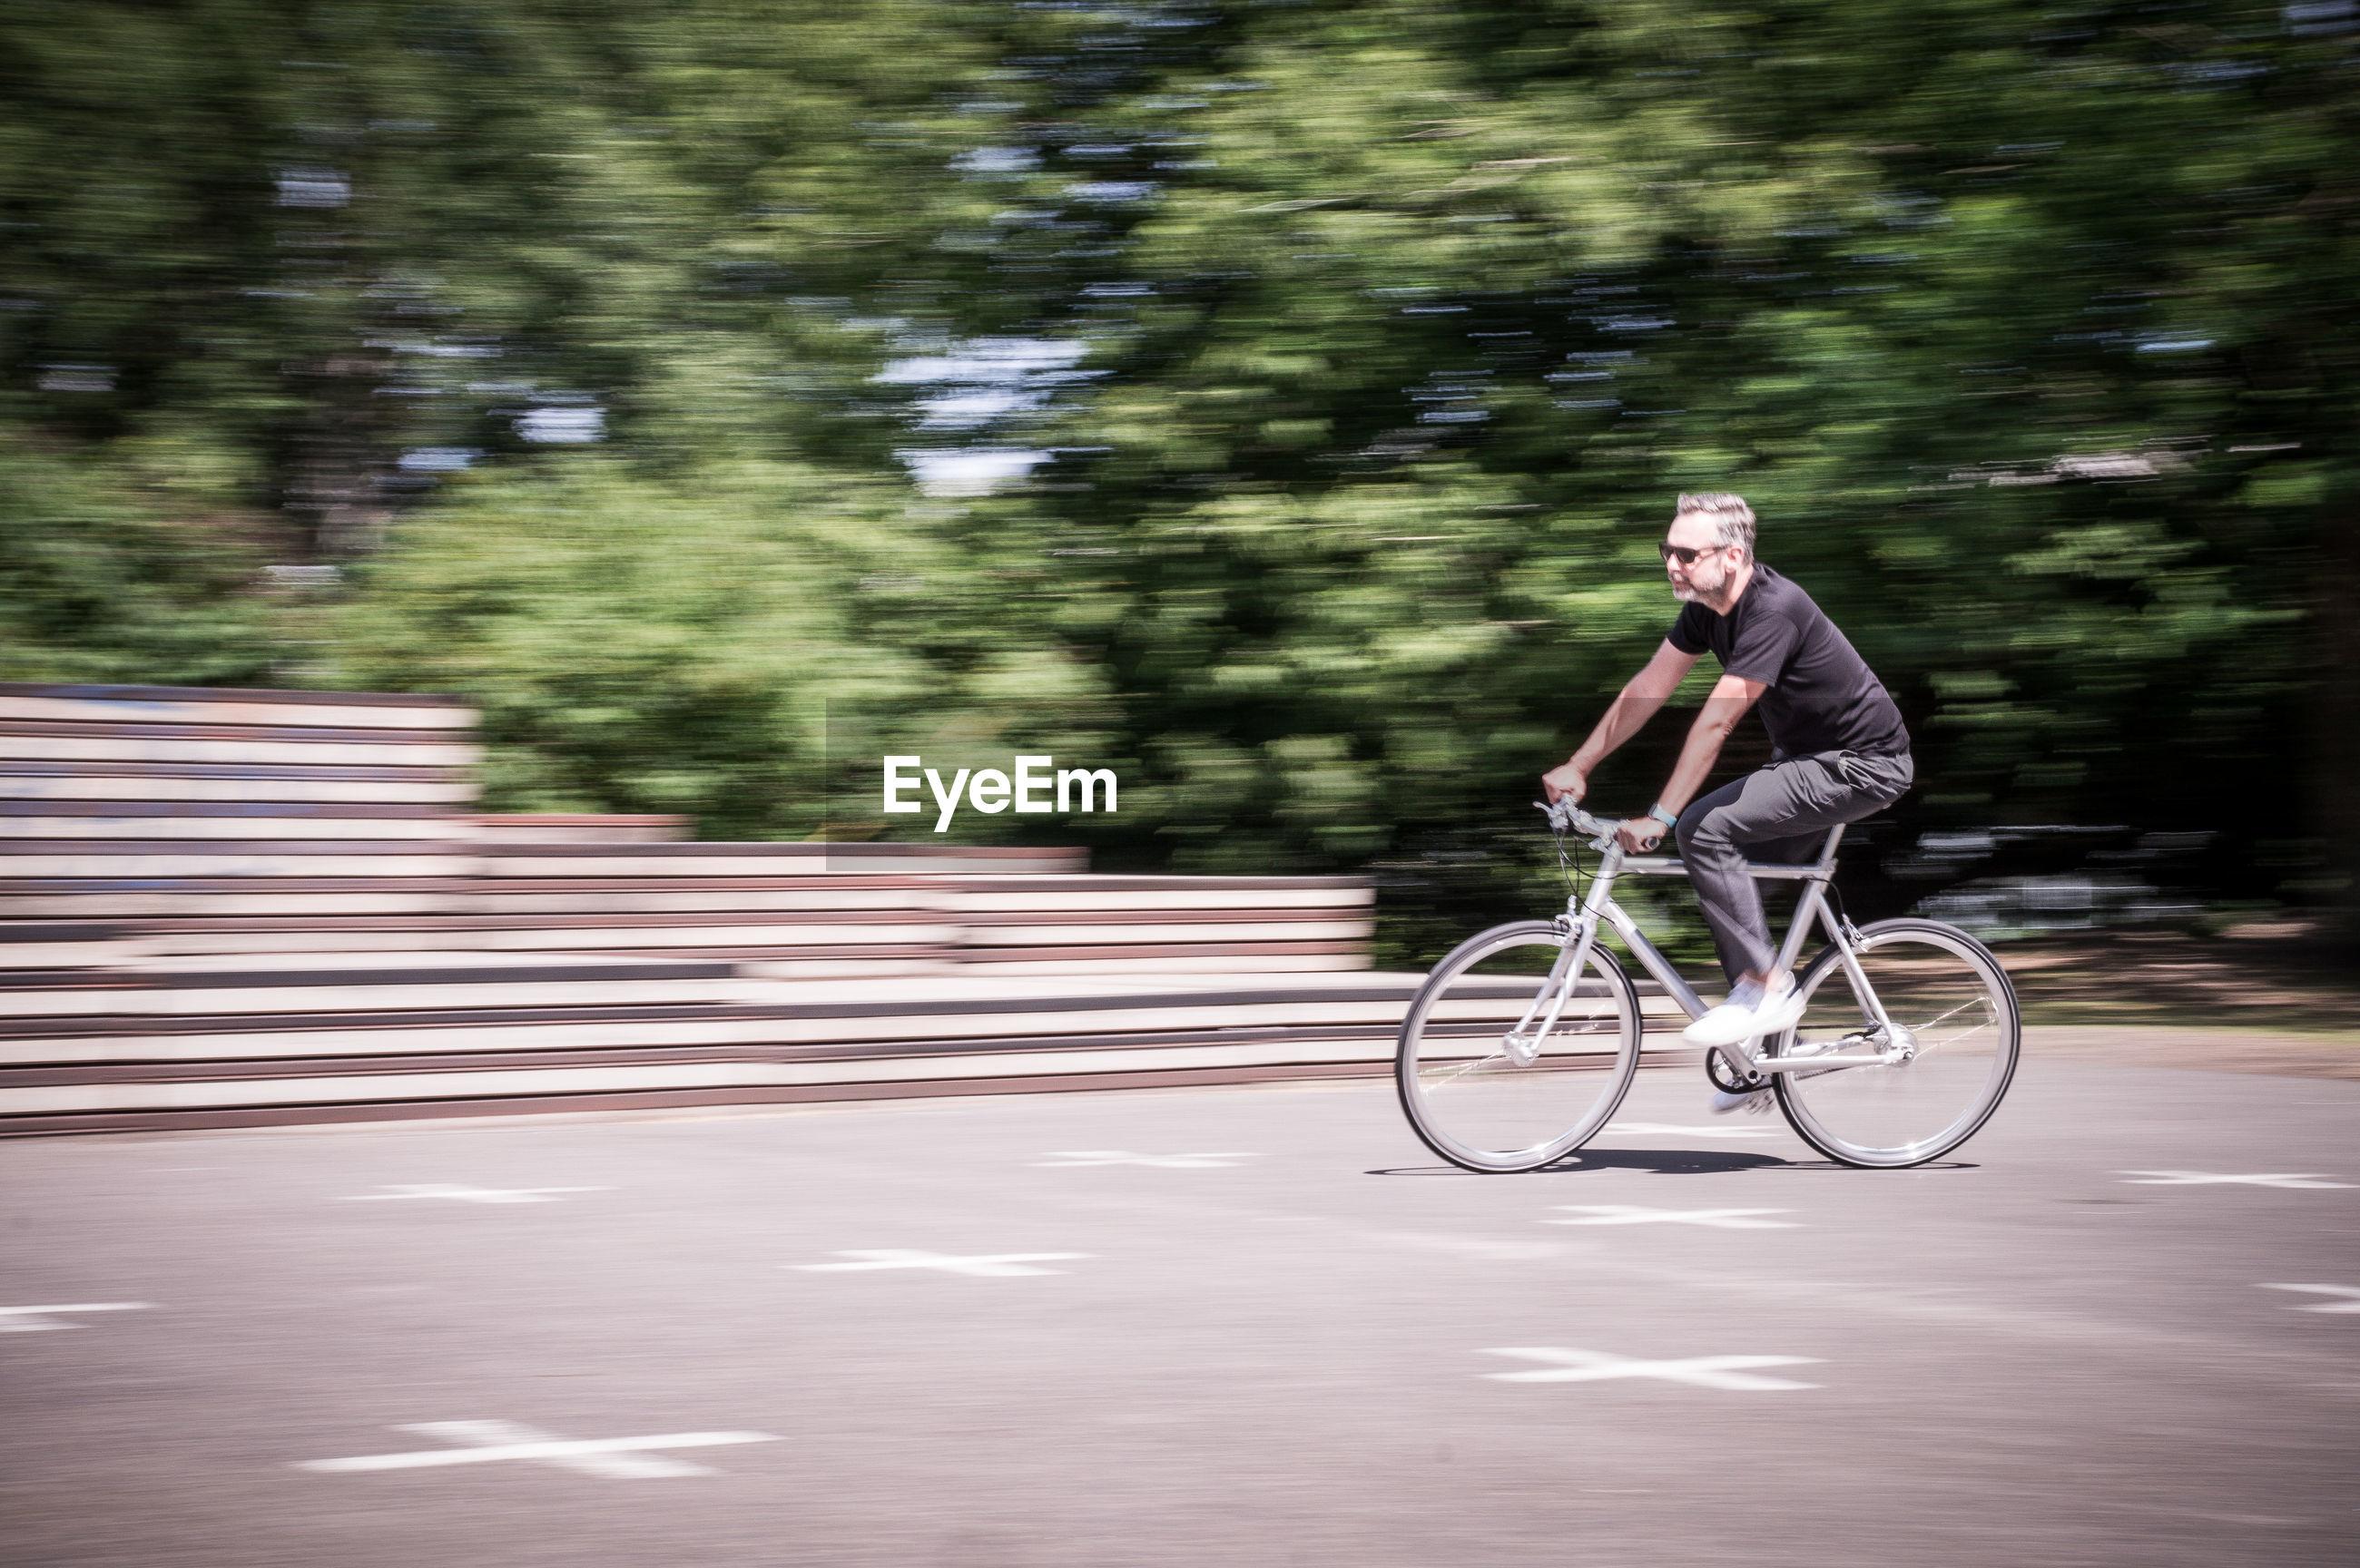 Man riding bicycle on road